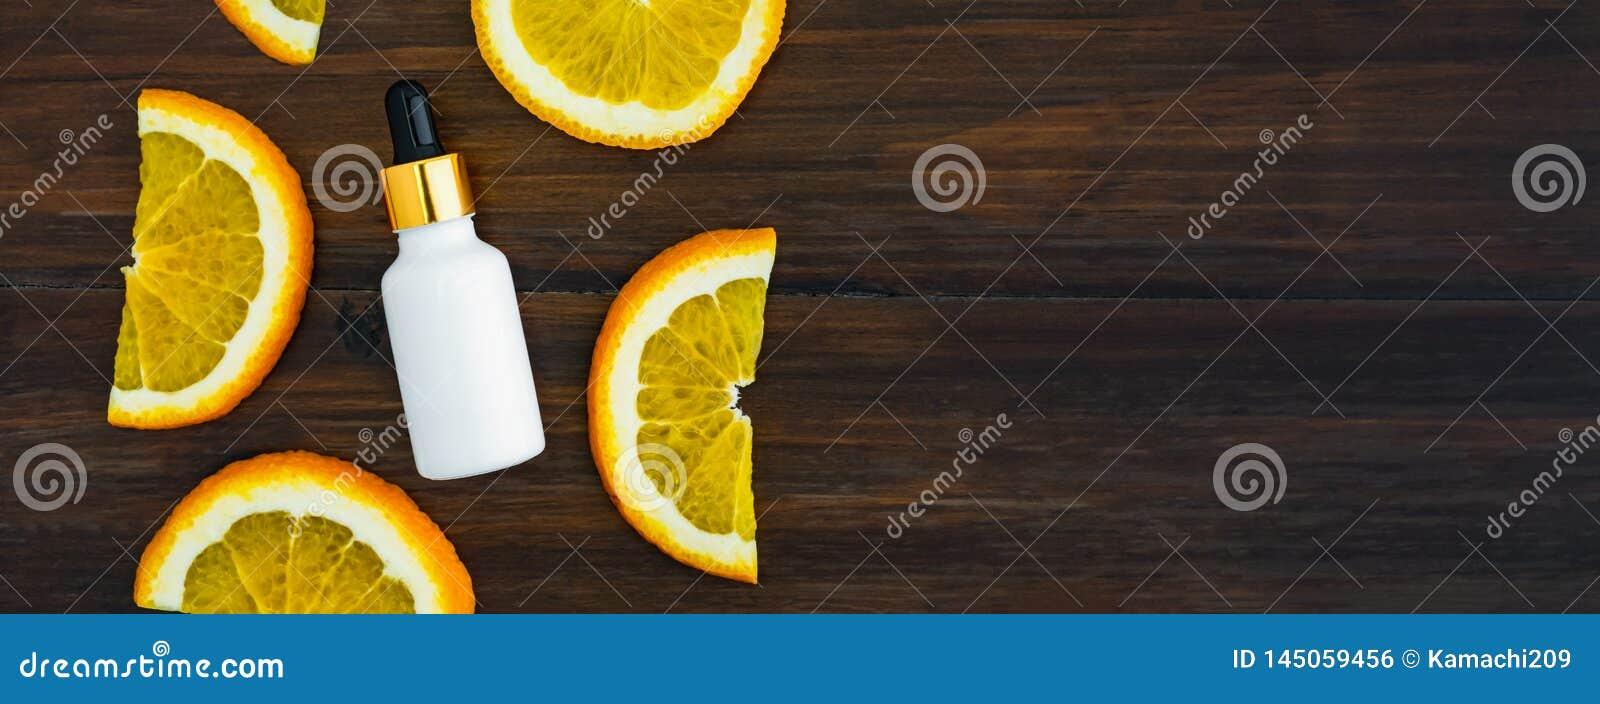 De witte de vitamine Cfles en olie maakten van oranje fruituittreksel, model van het merk van het schoonheidsproduct Hoogste meni